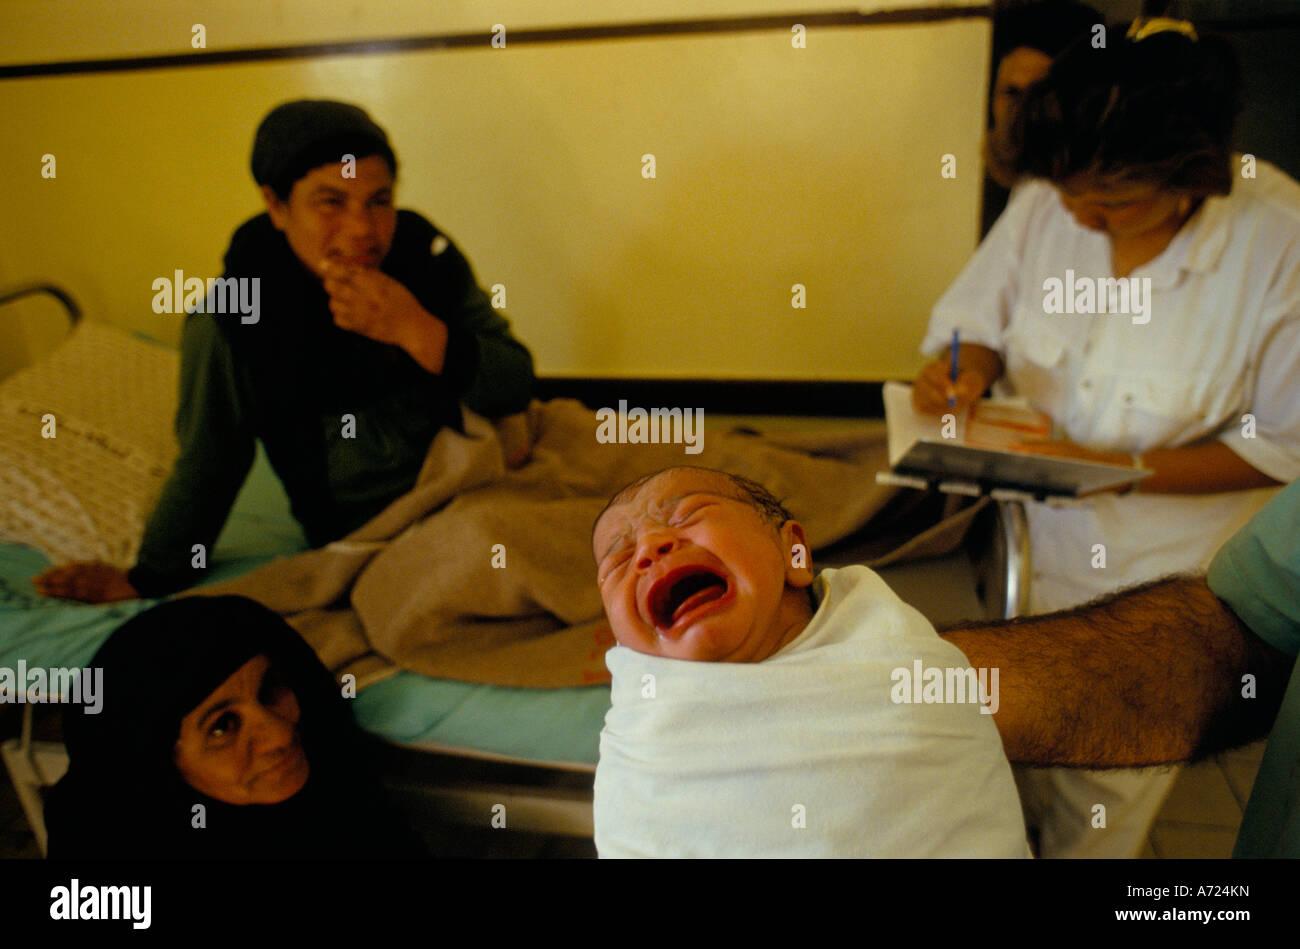 Hospital Relatives Doctor Stock Photos & Hospital Relatives